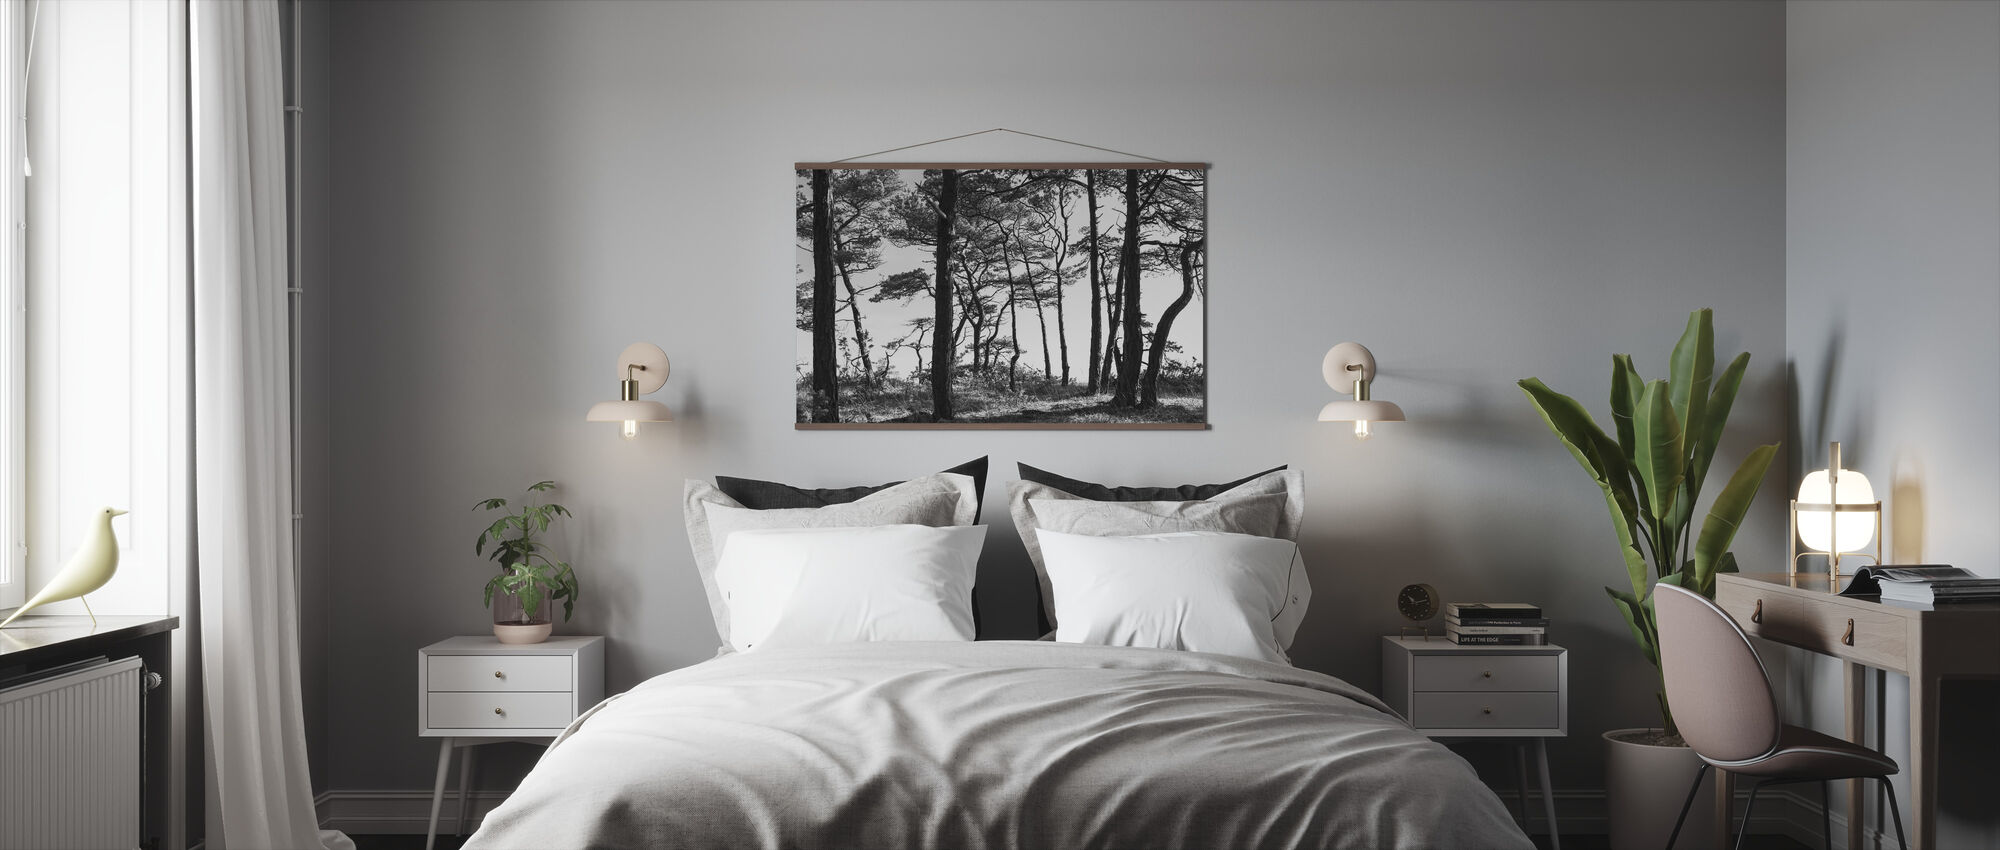 Zwarte dennenbos, zwart en wit - Poster - Slaapkamer